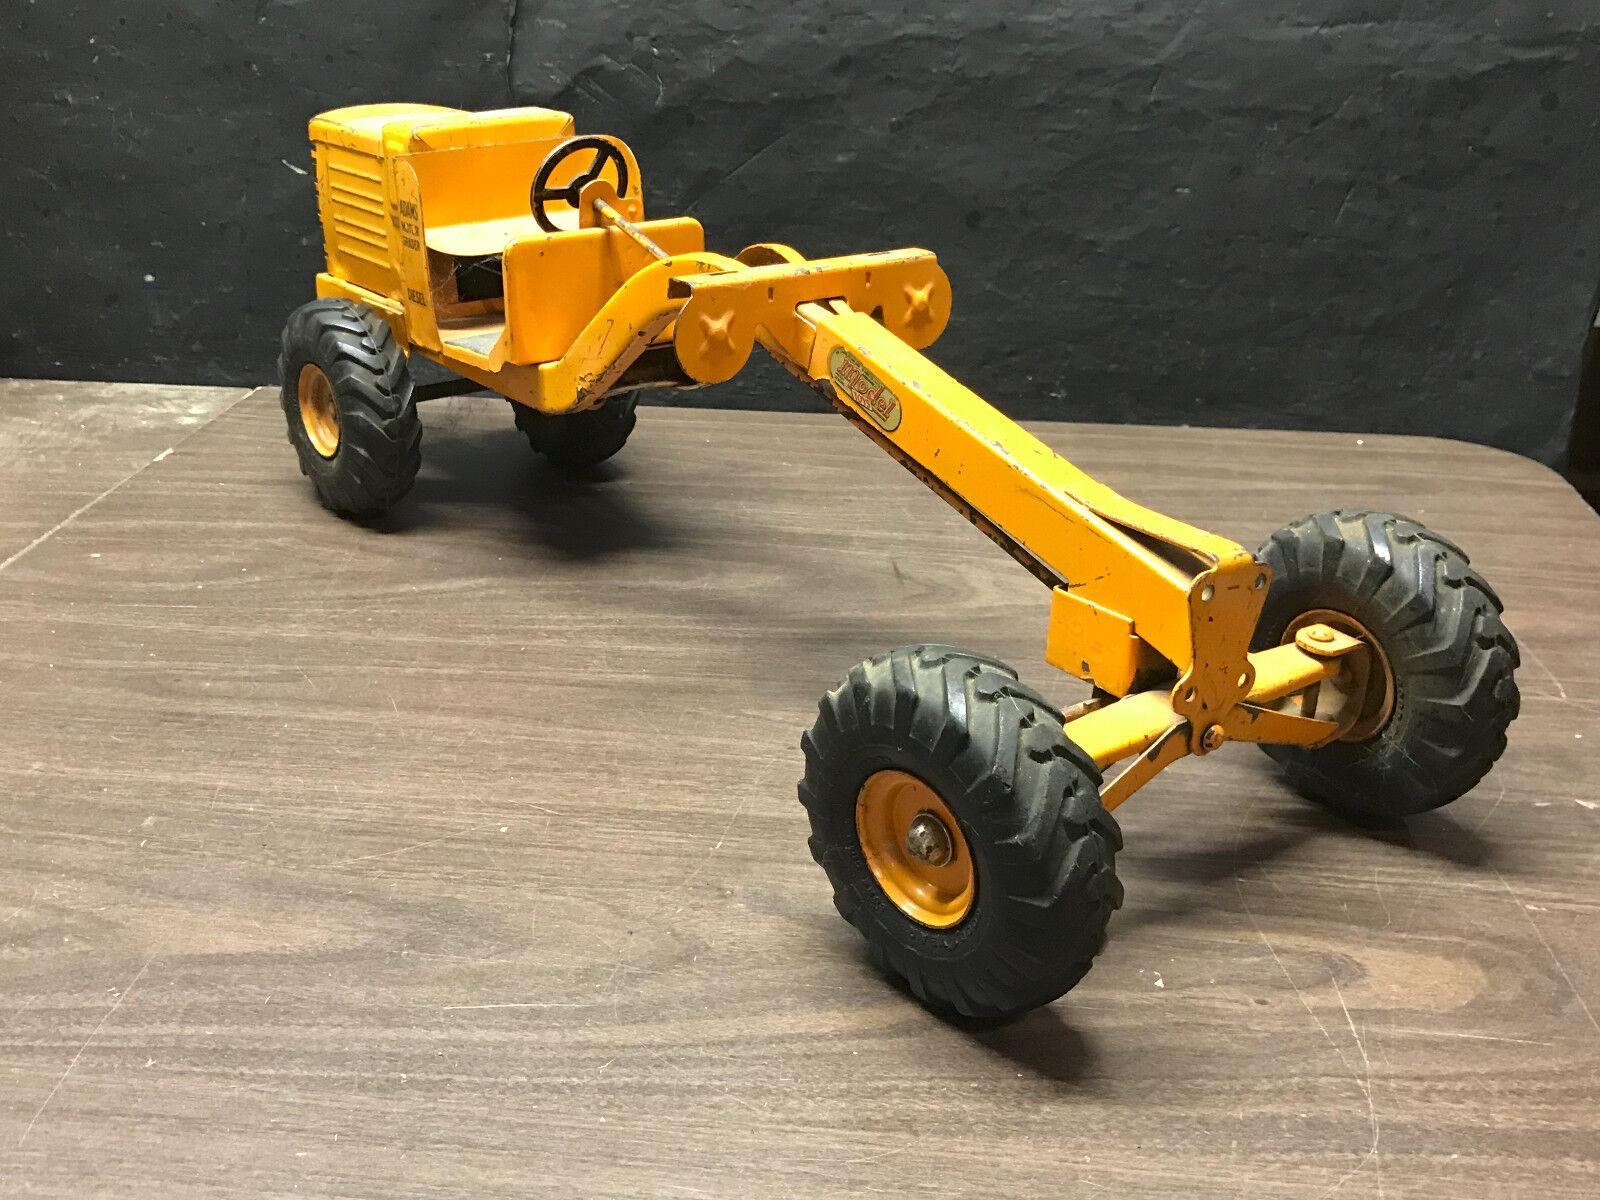 Pressed Steel doepke Model  toys Adams MOTEUR DIESEL ROAD GRADER  promotions passionnantes